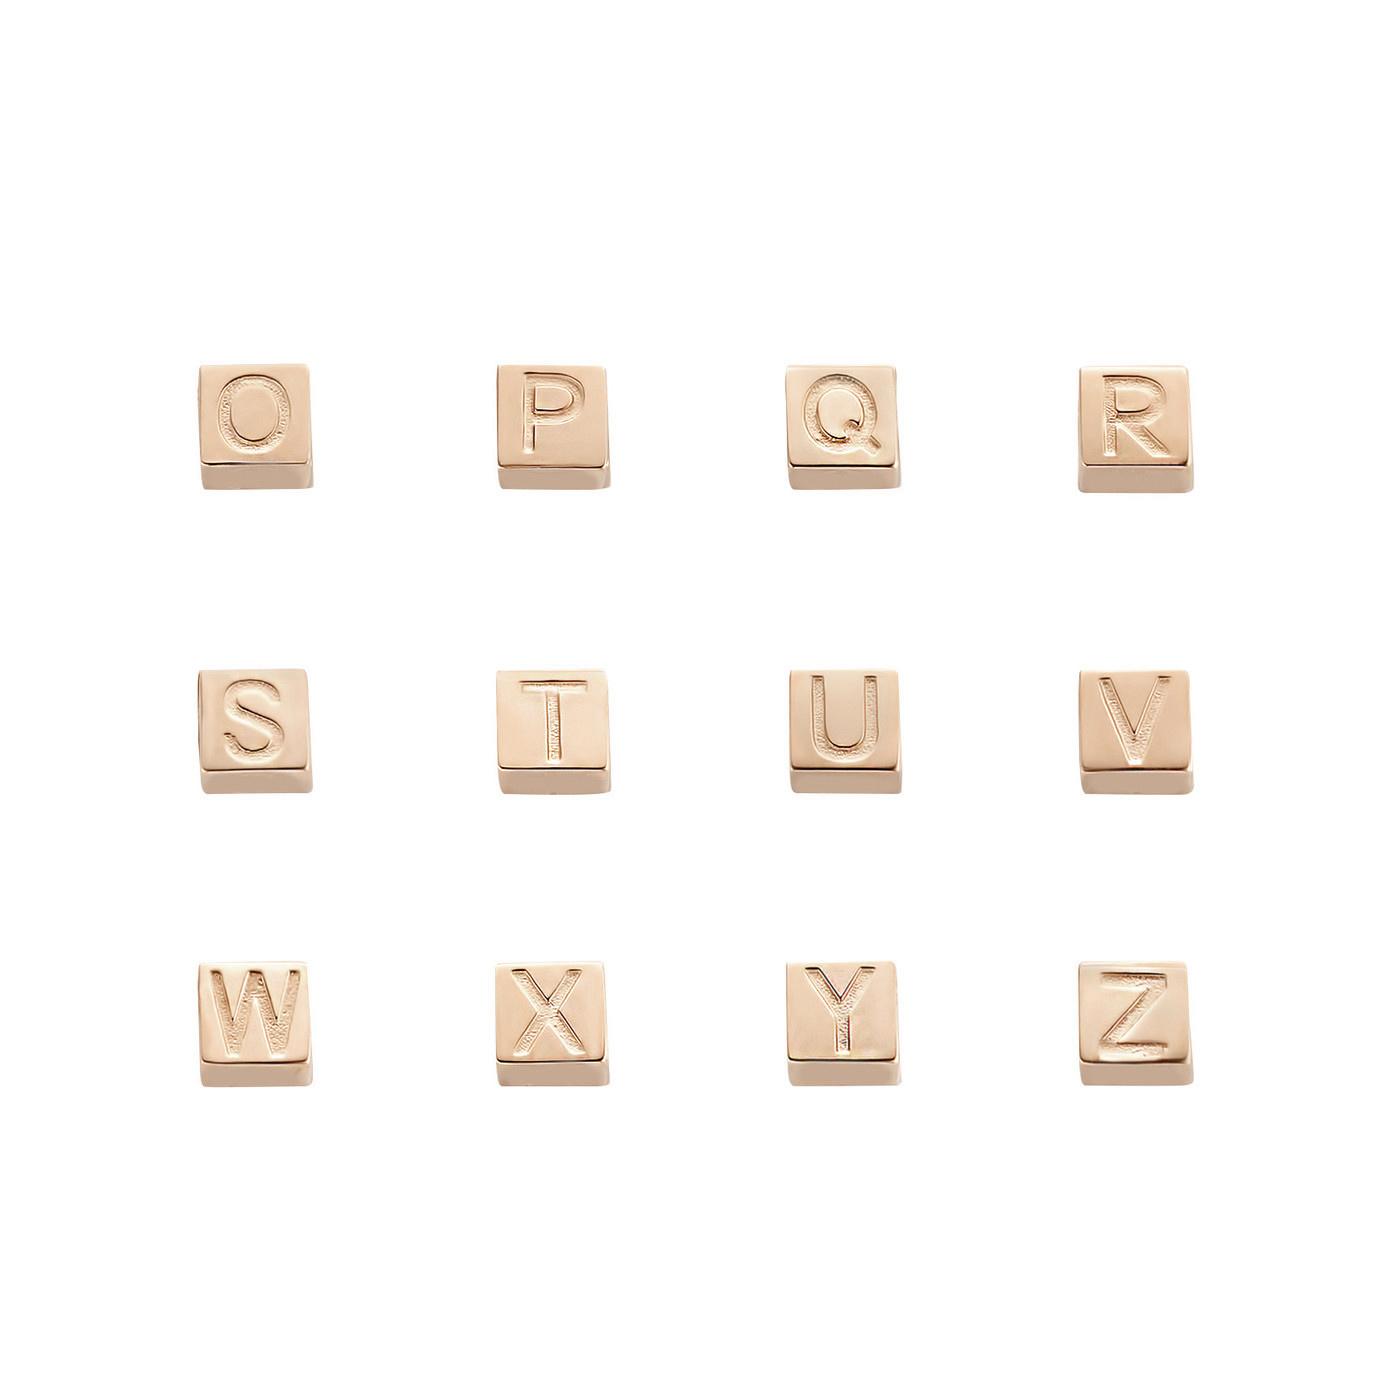 Isabel Bernard La Concorde Felie ciondolo iniziale cubo in oro rosa 14 carati